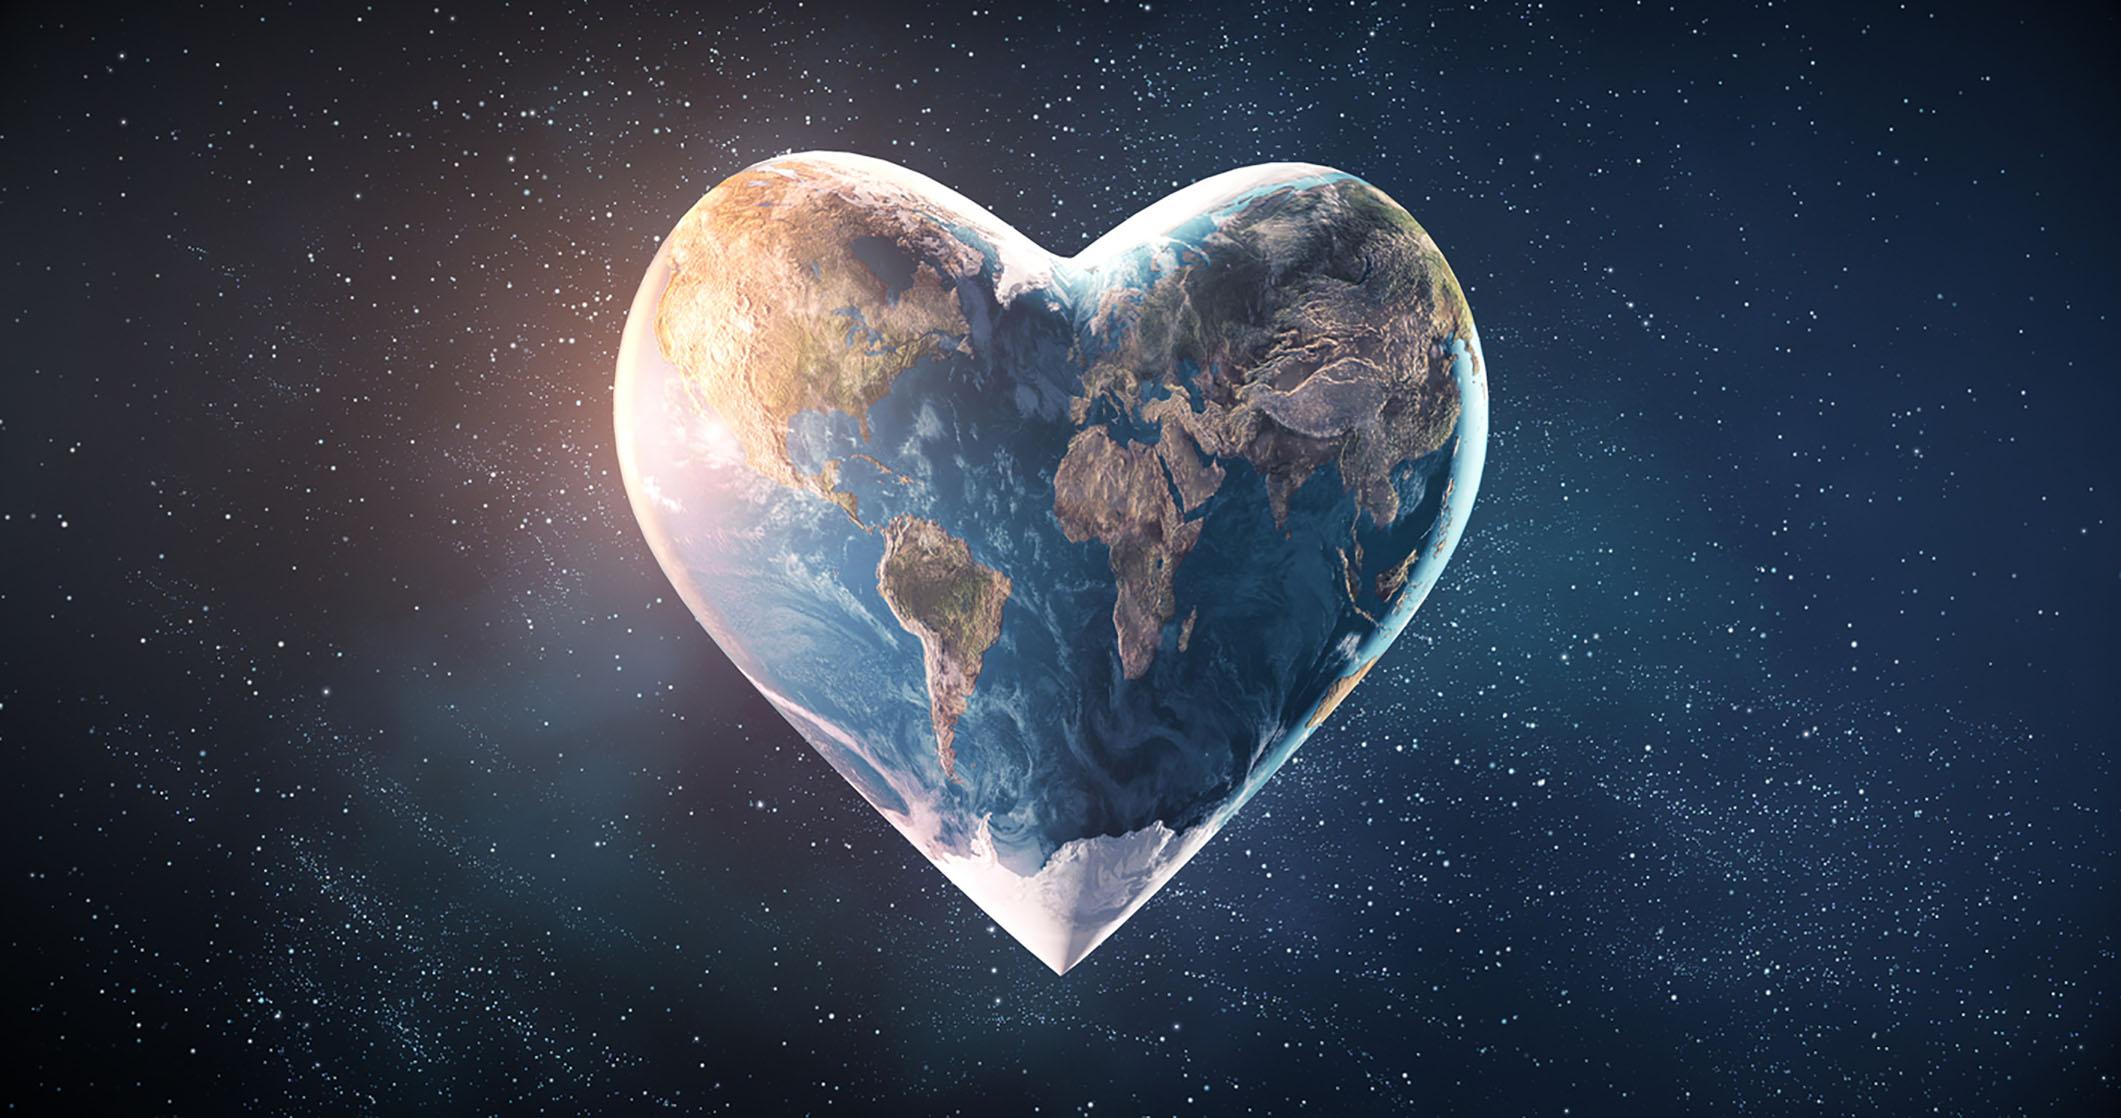 Hjerteformet jordklode